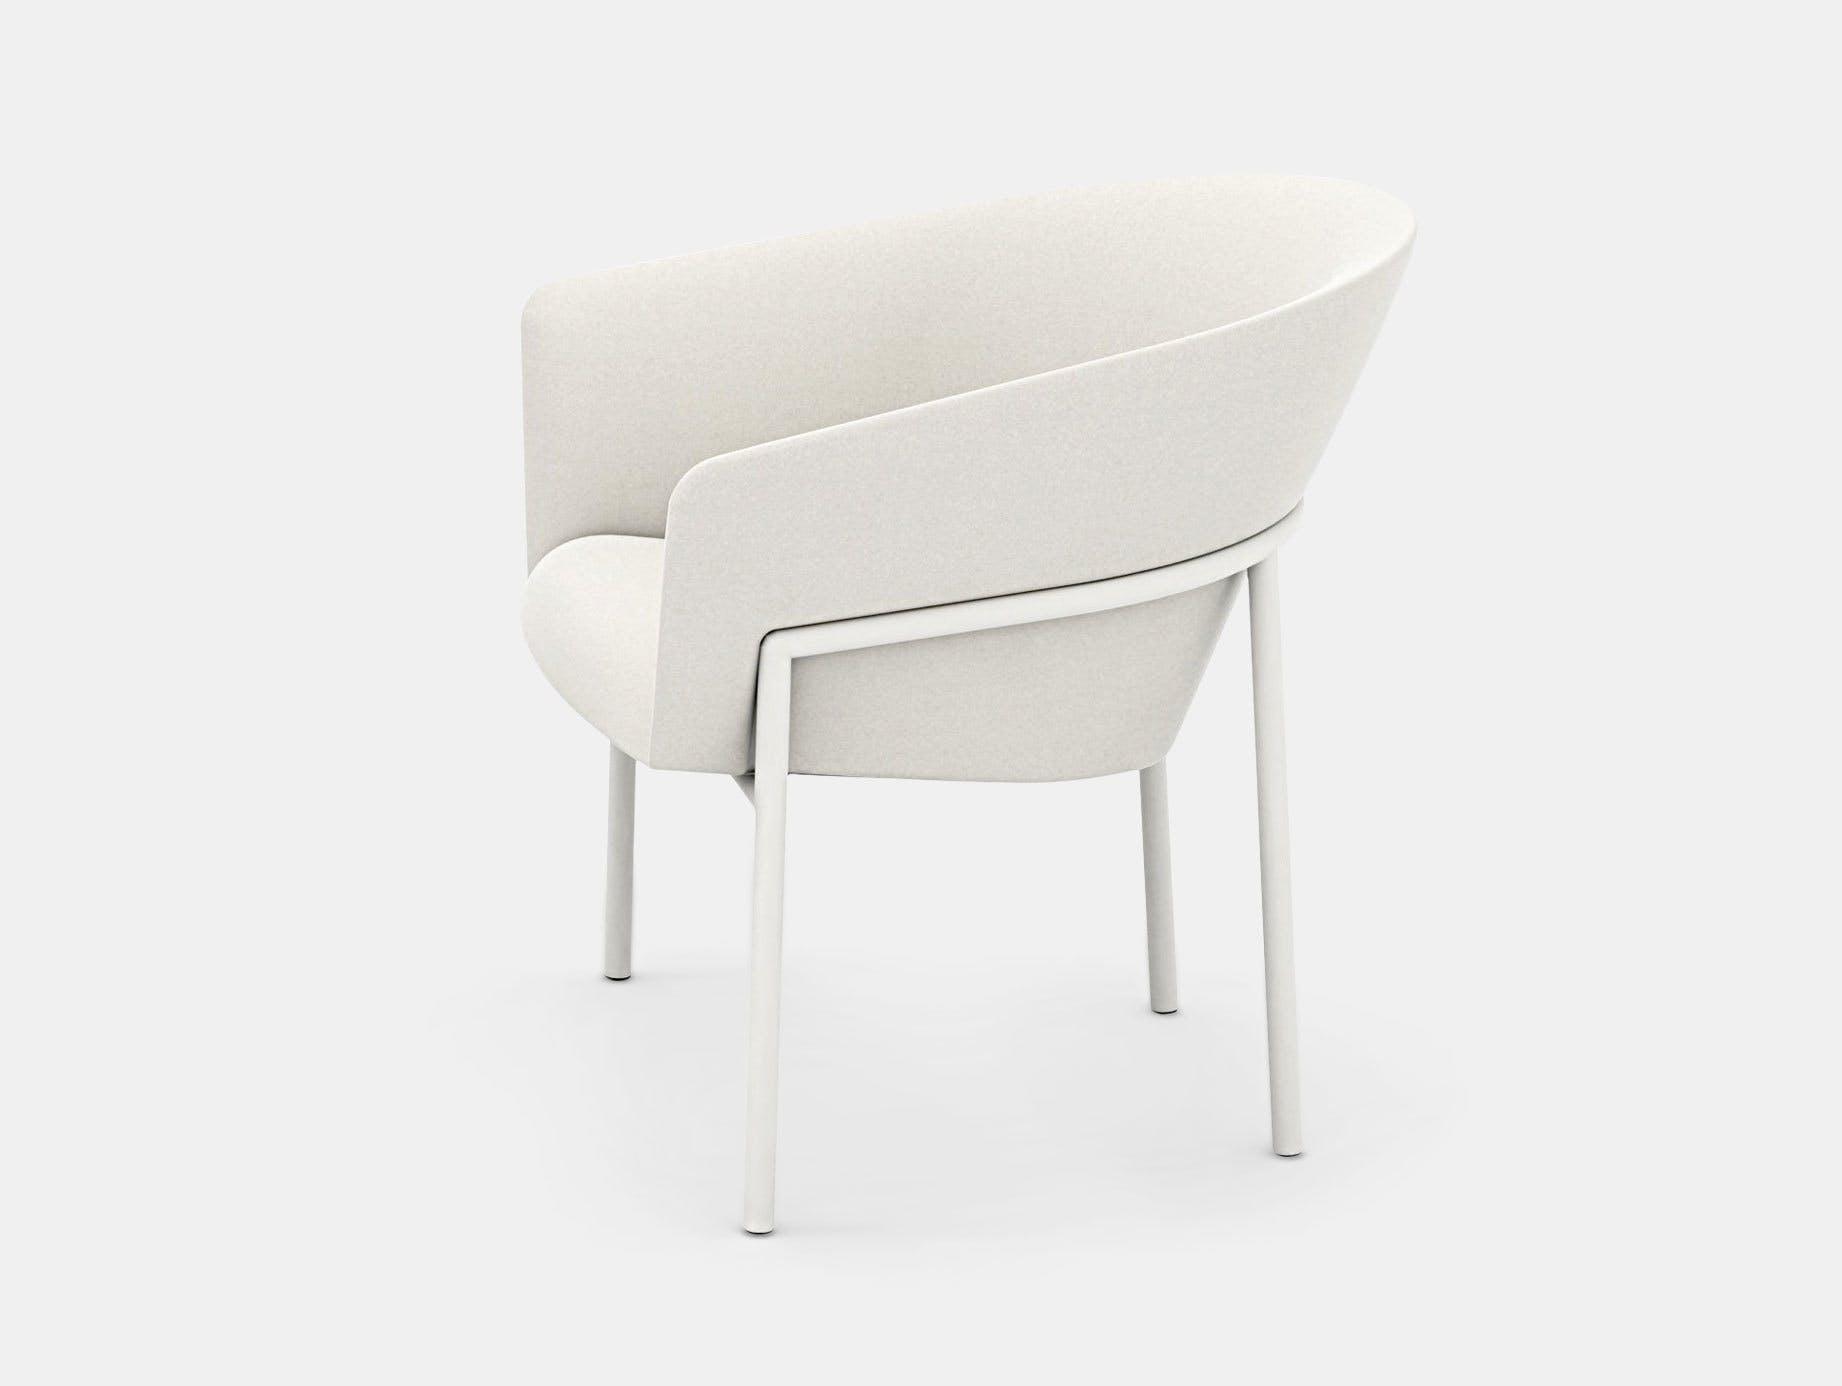 Bensen Metro Lounge Chair white frame Niels Bendtsen